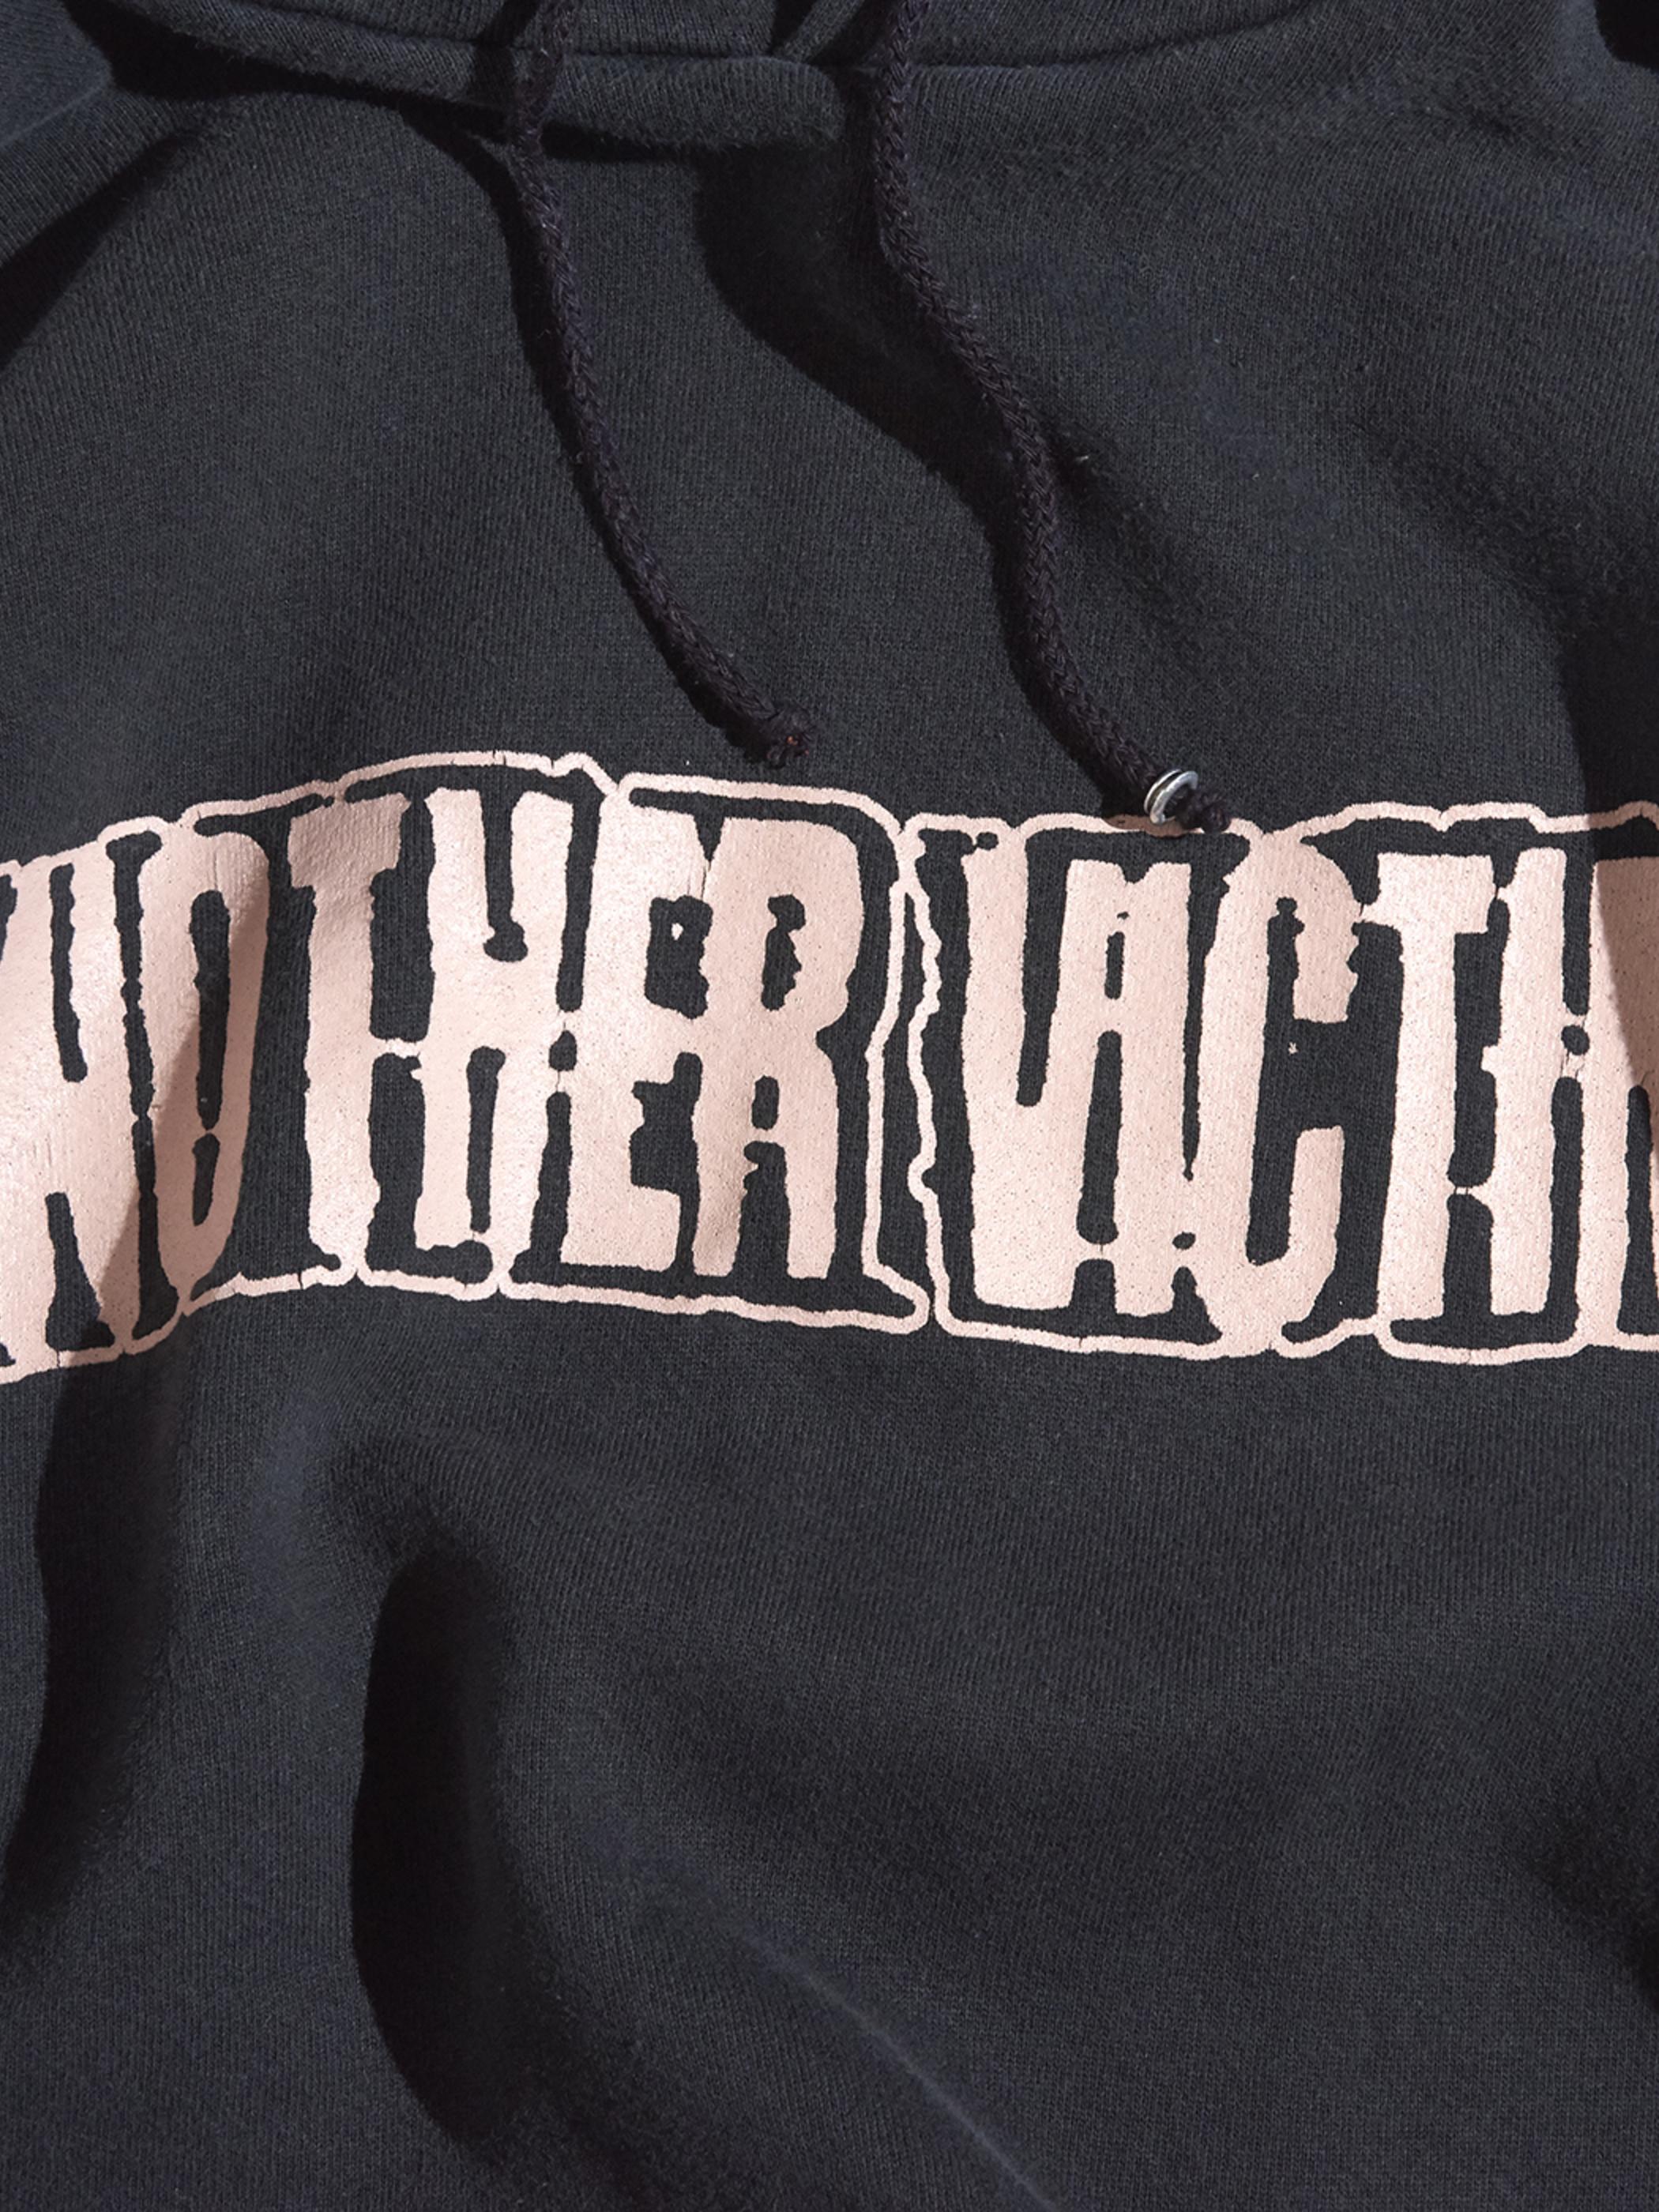 "2000s ""ANOTHER VICTIM"" sweat hoodie -BLACK-"